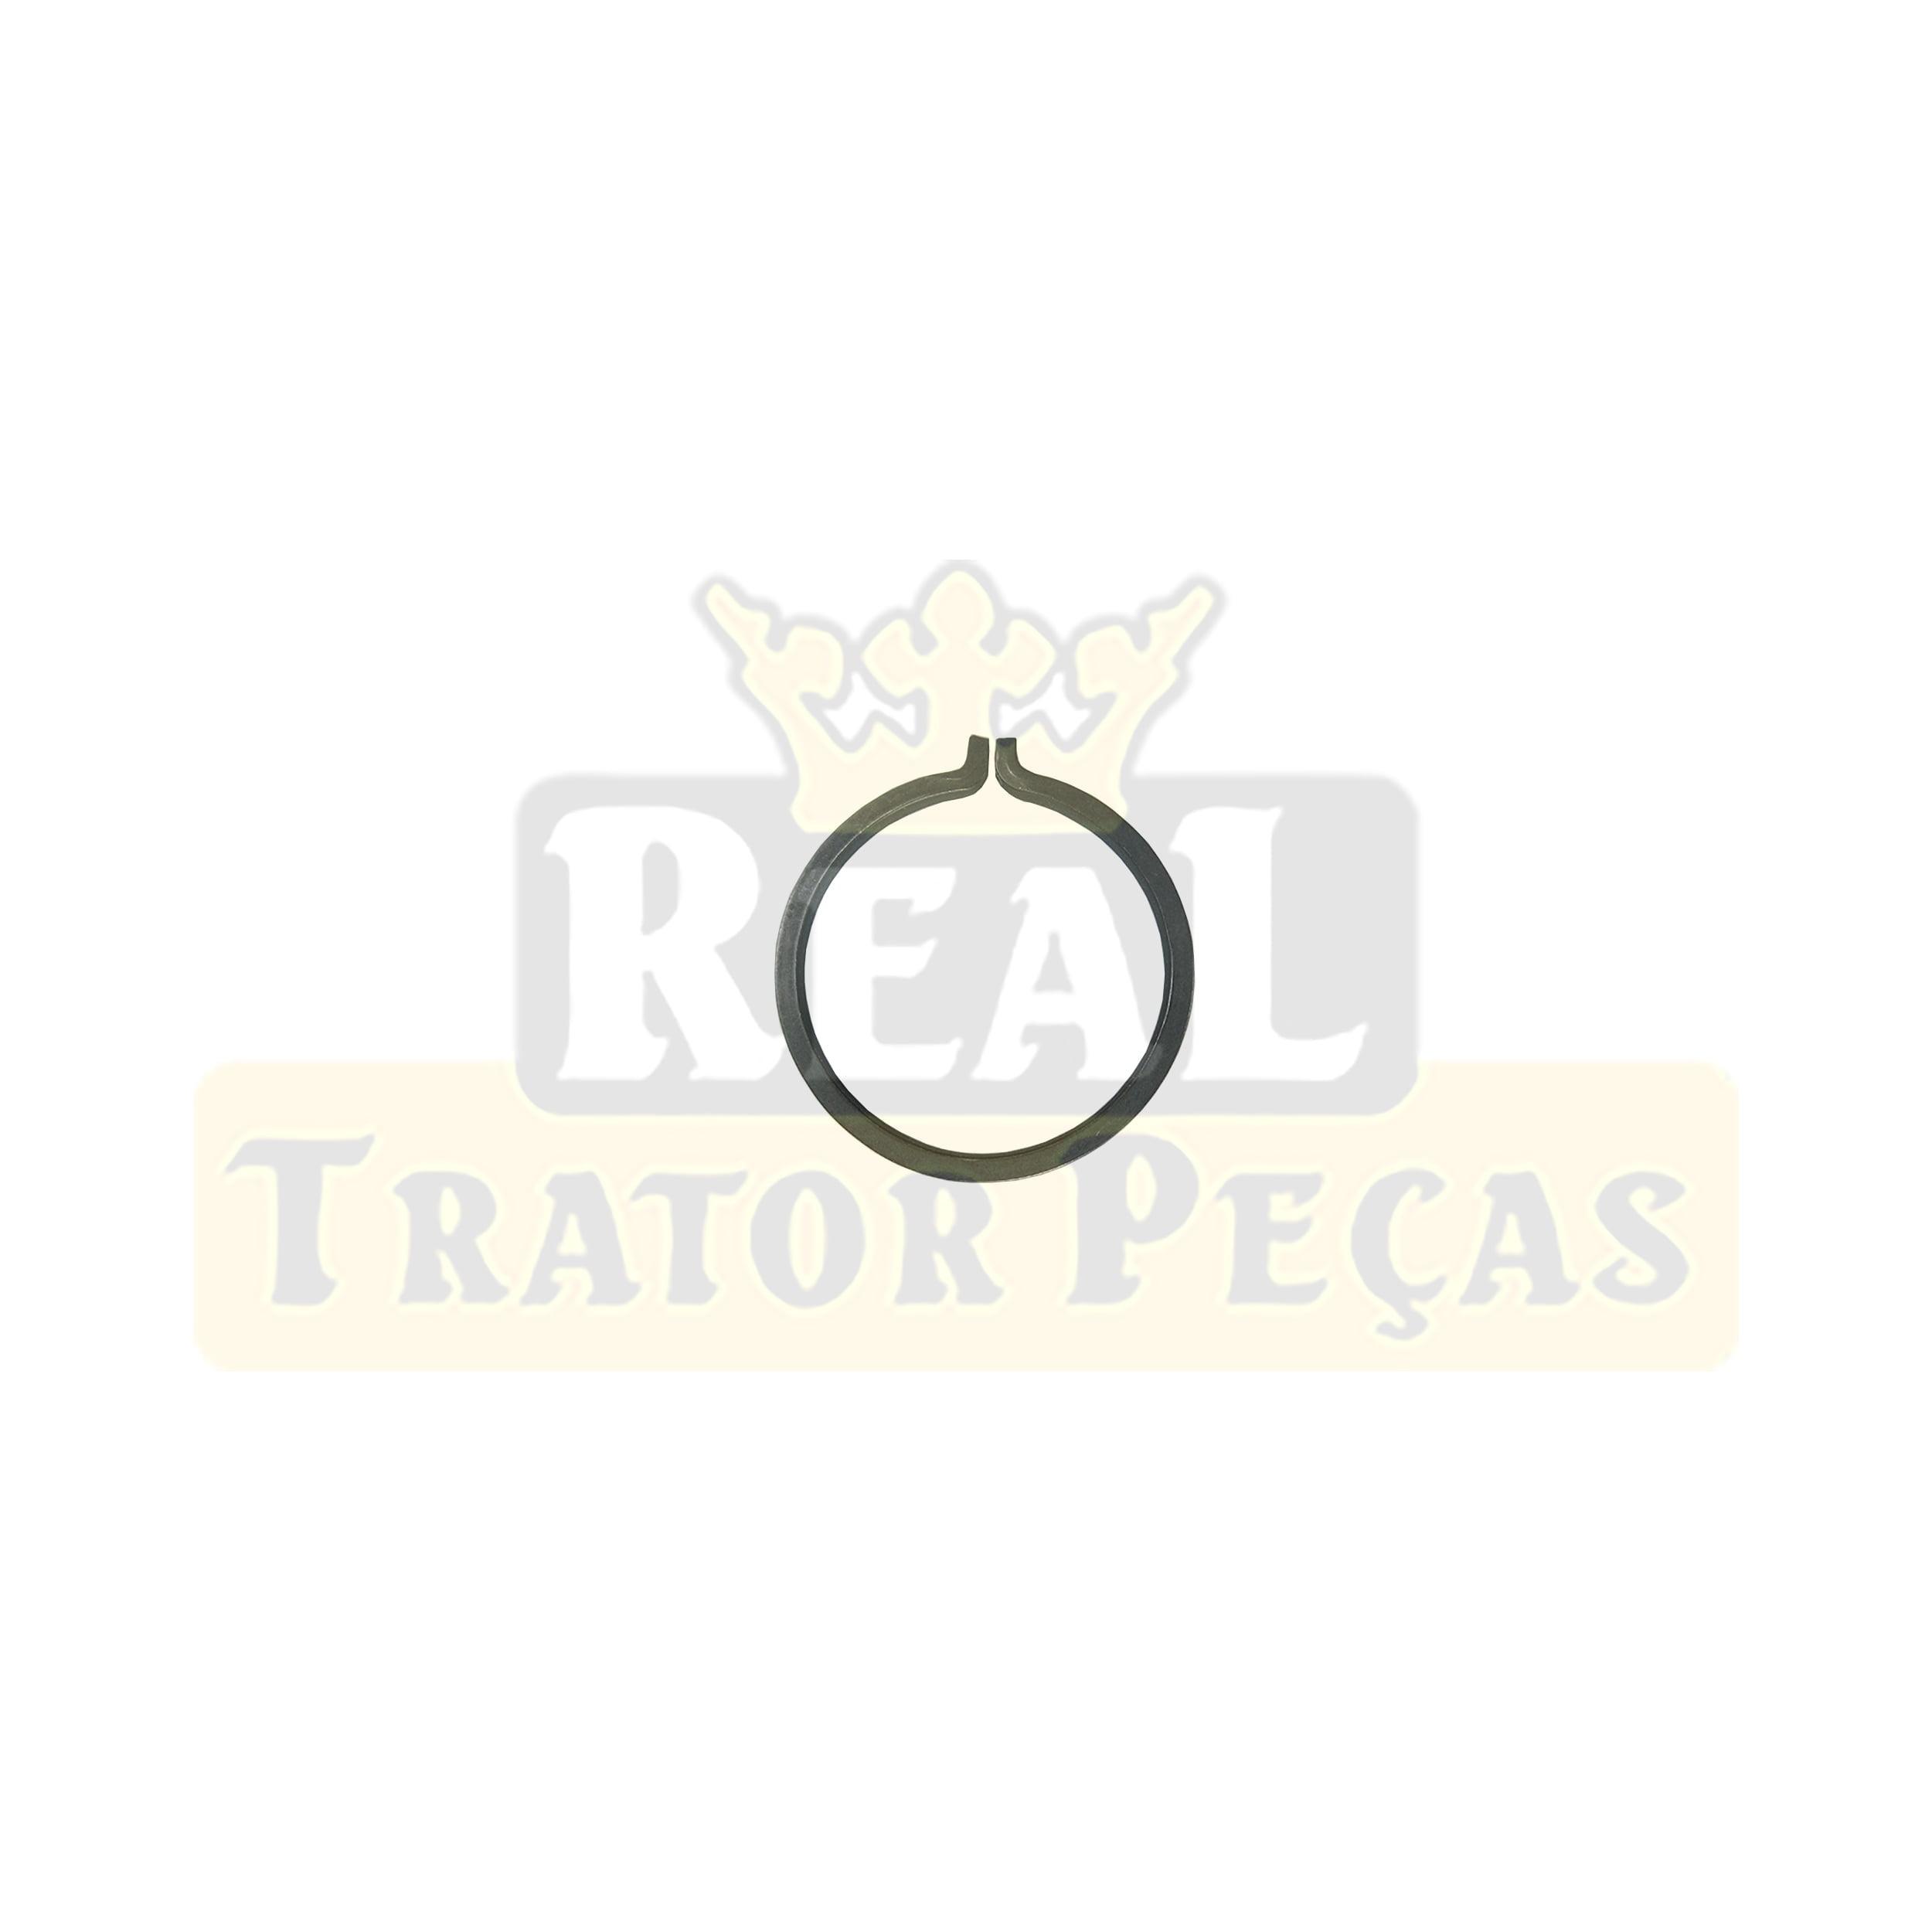 ANEL TRAVA PINHÃO - TRAÇÃO ZF APL350 - MASSEY FERGUSON 290 A 299 / 610 / 620 / 630 / 640 | VALTRA 985 / 1180 / BM85/100/110/120 | NEW HOLLAND 7630 / 7830 / 8030 JOHN DEERE 6300 / 6405 / 6600 / 6605 AGRALE BX490 / BX4110 / BX4130 / BX6110 / BX6130